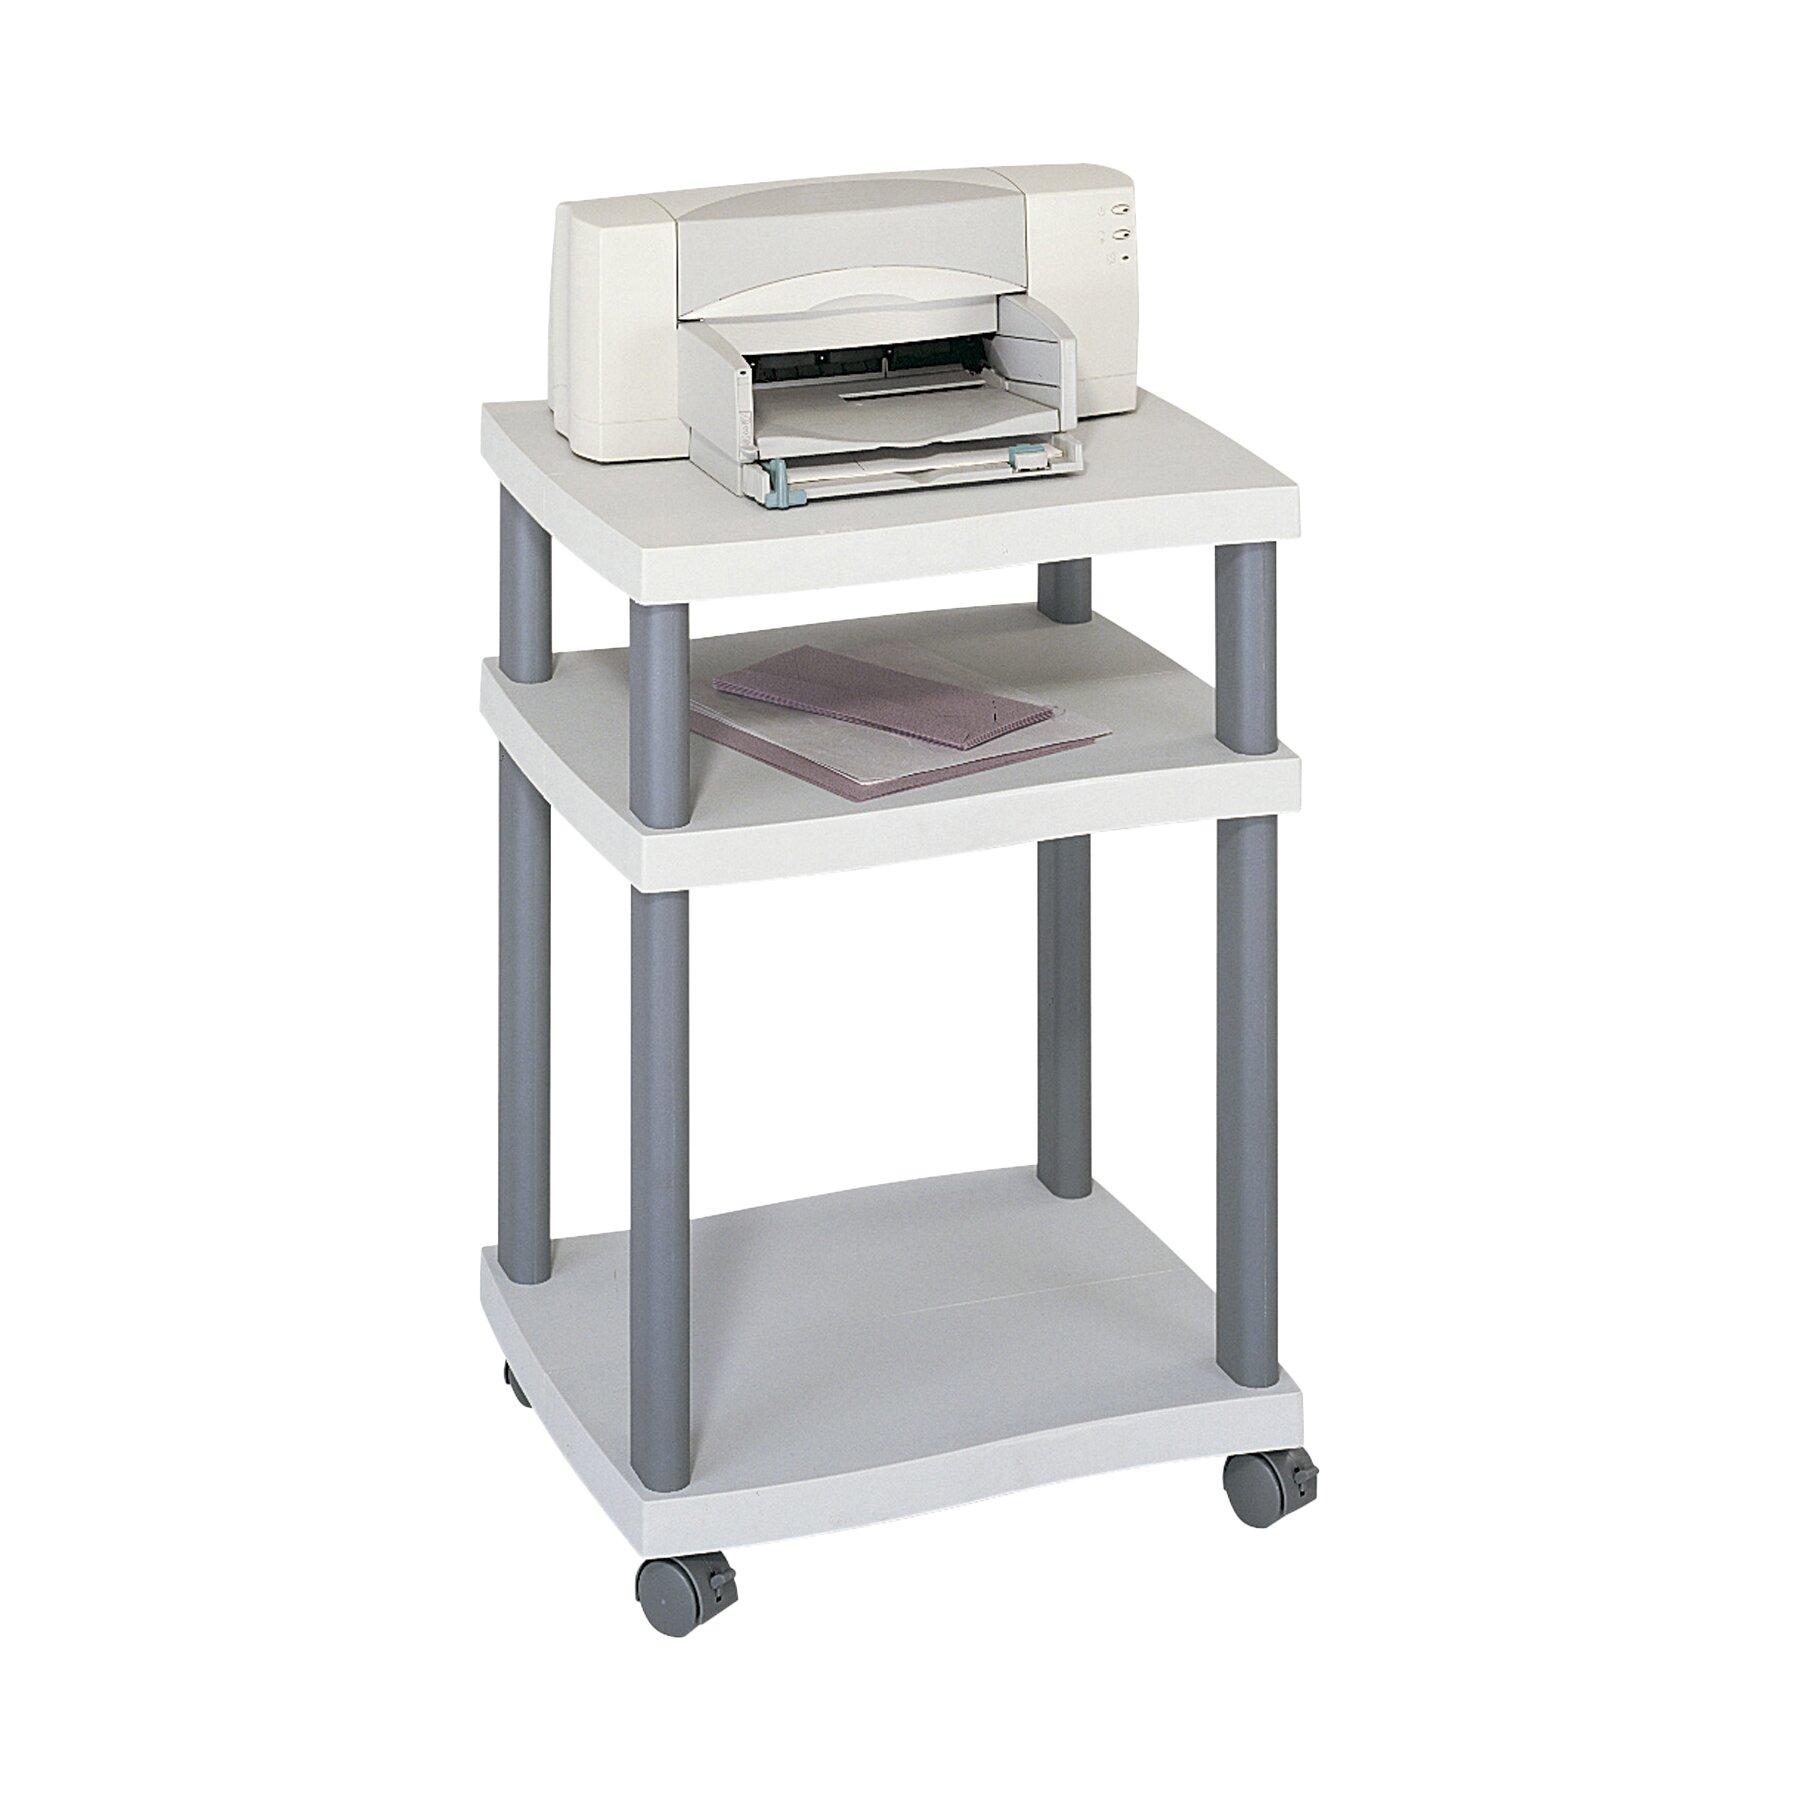 Safco Wave Mobile Printer Stand with 2 Shelves & Reviews | Wayfair ...